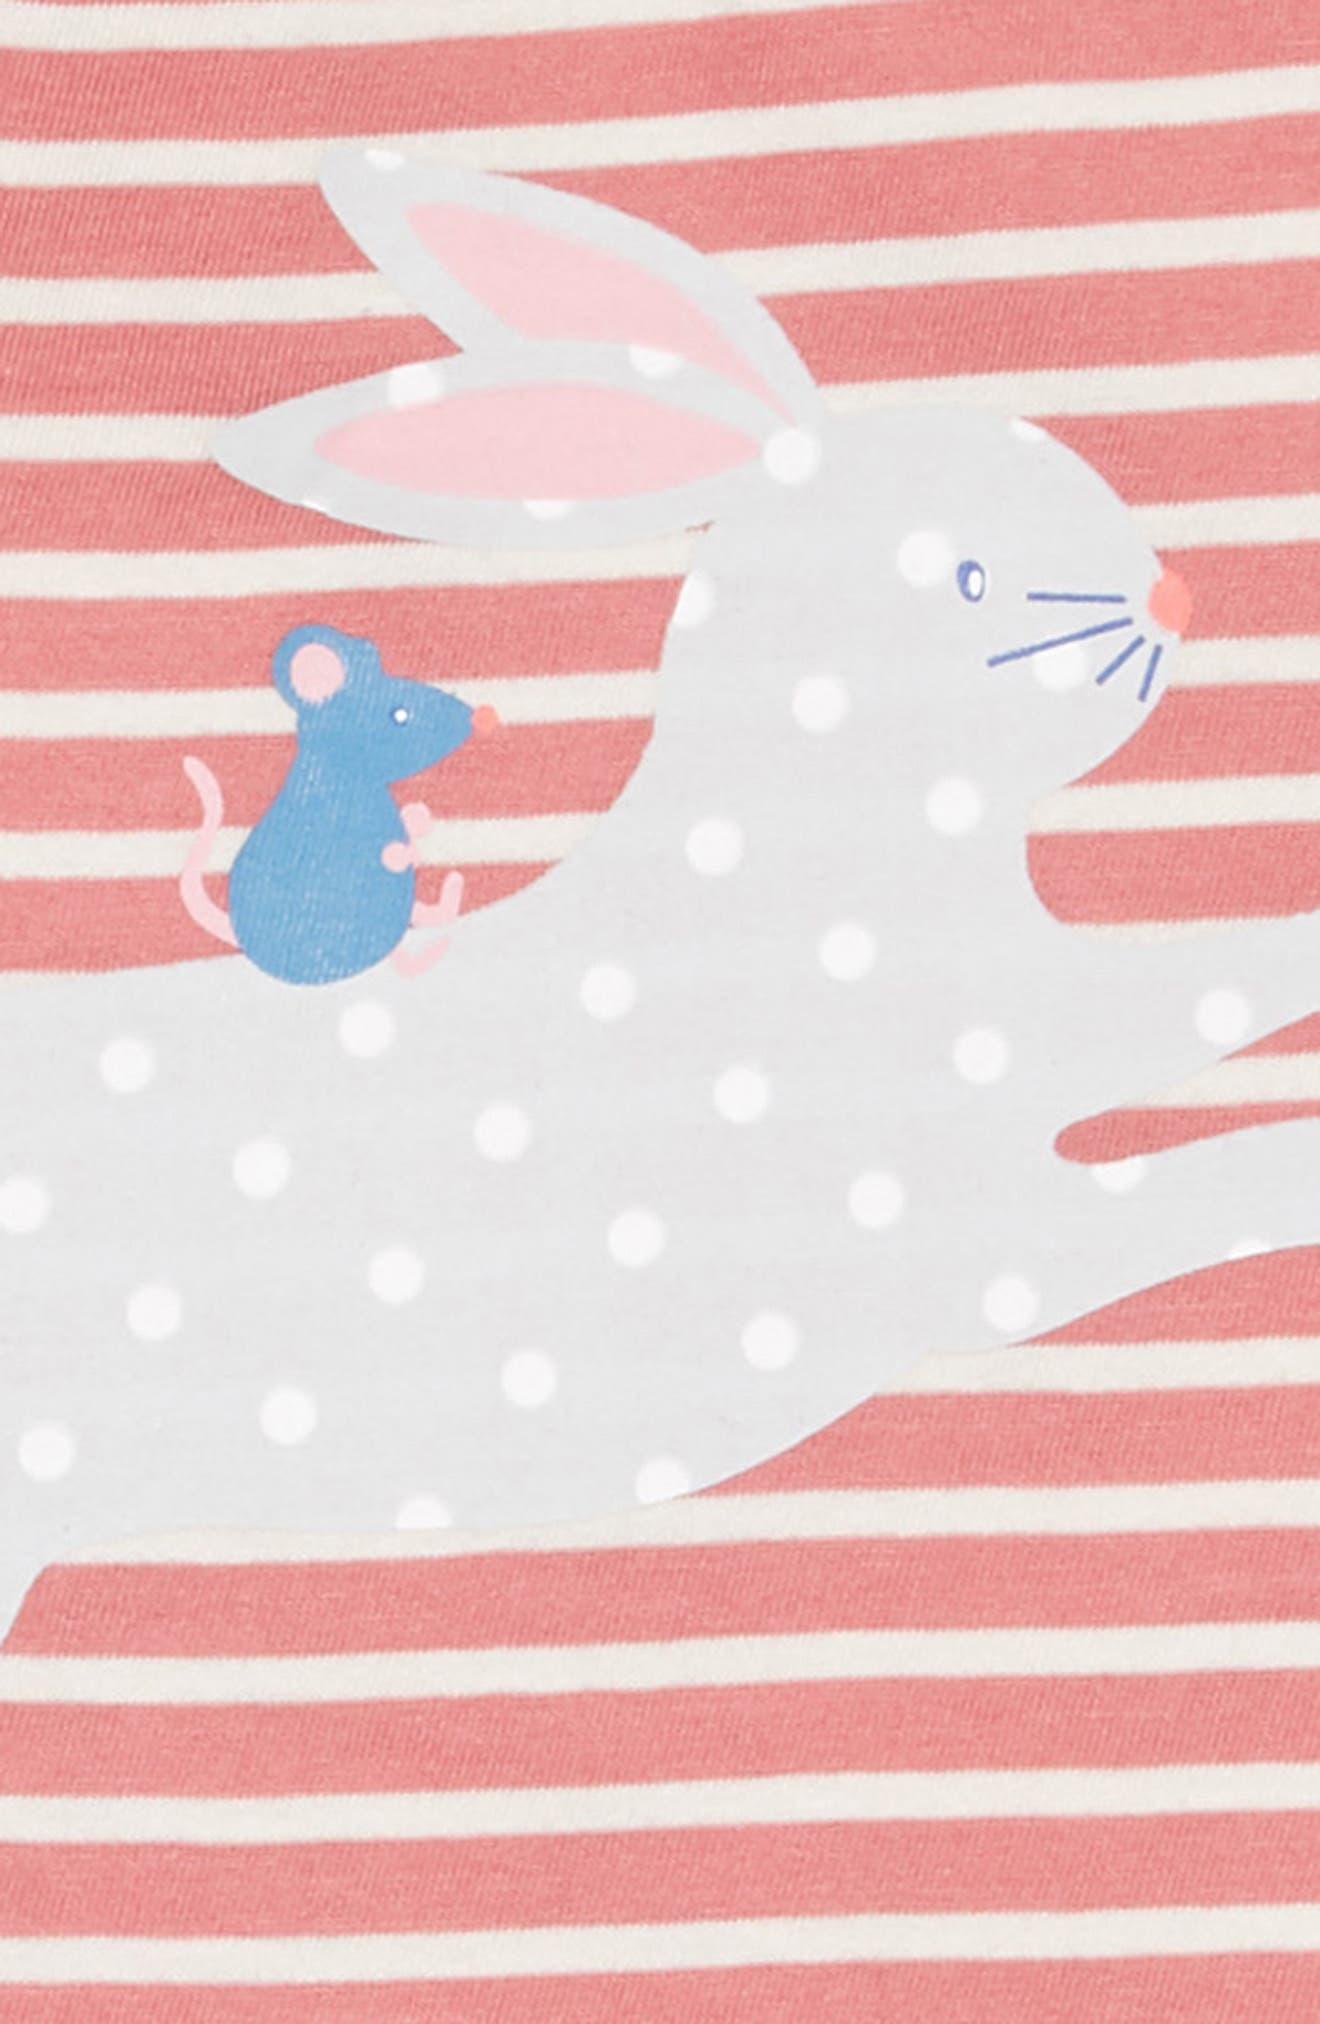 Reversible Jersey Dress,                             Alternate thumbnail 4, color,                             AUTUMN ROSE/ ECRU